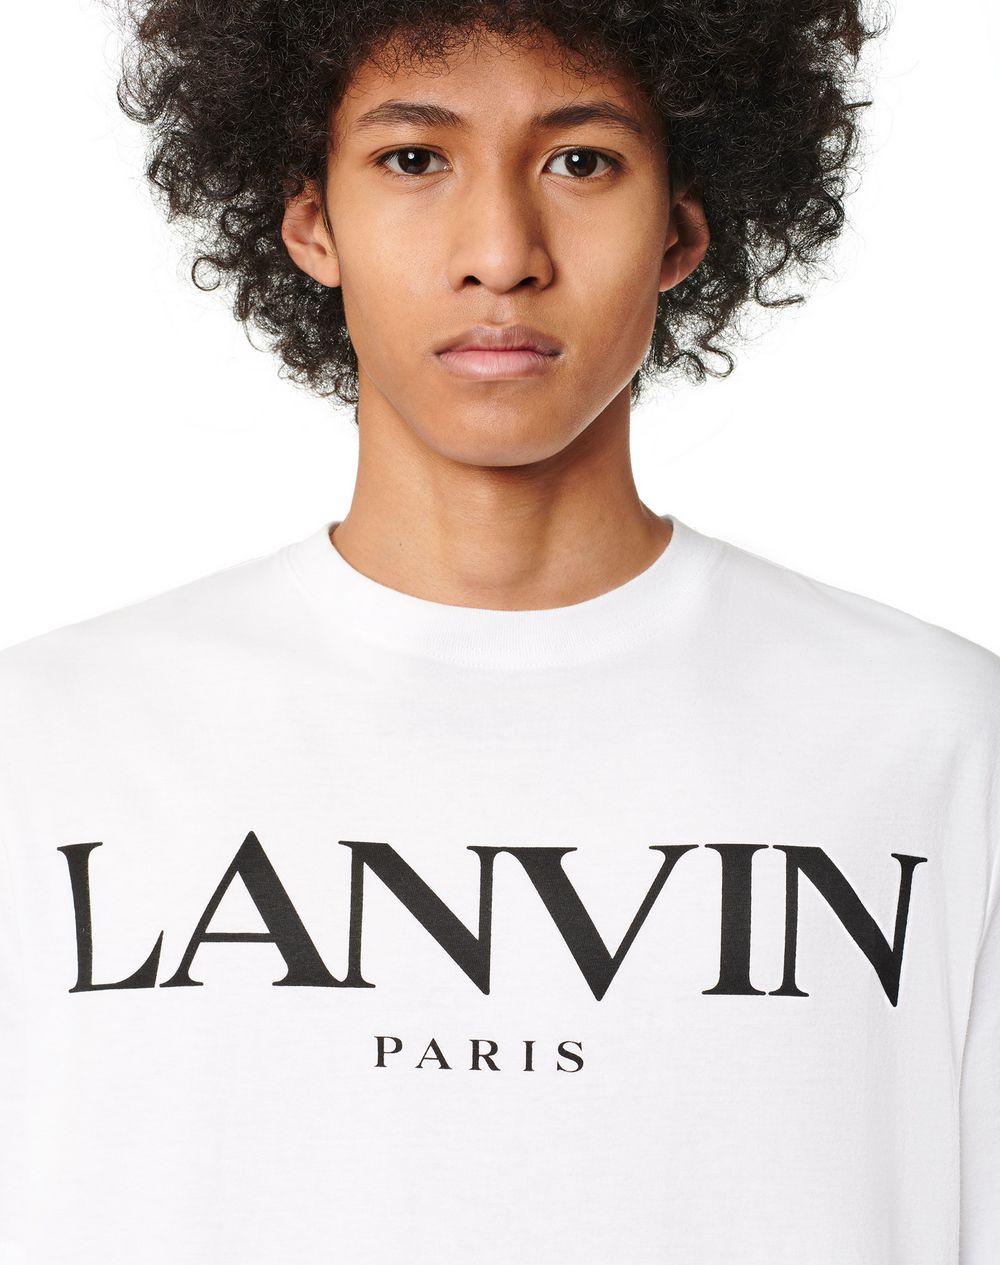 PRINTED T-SHIRT - Lanvin